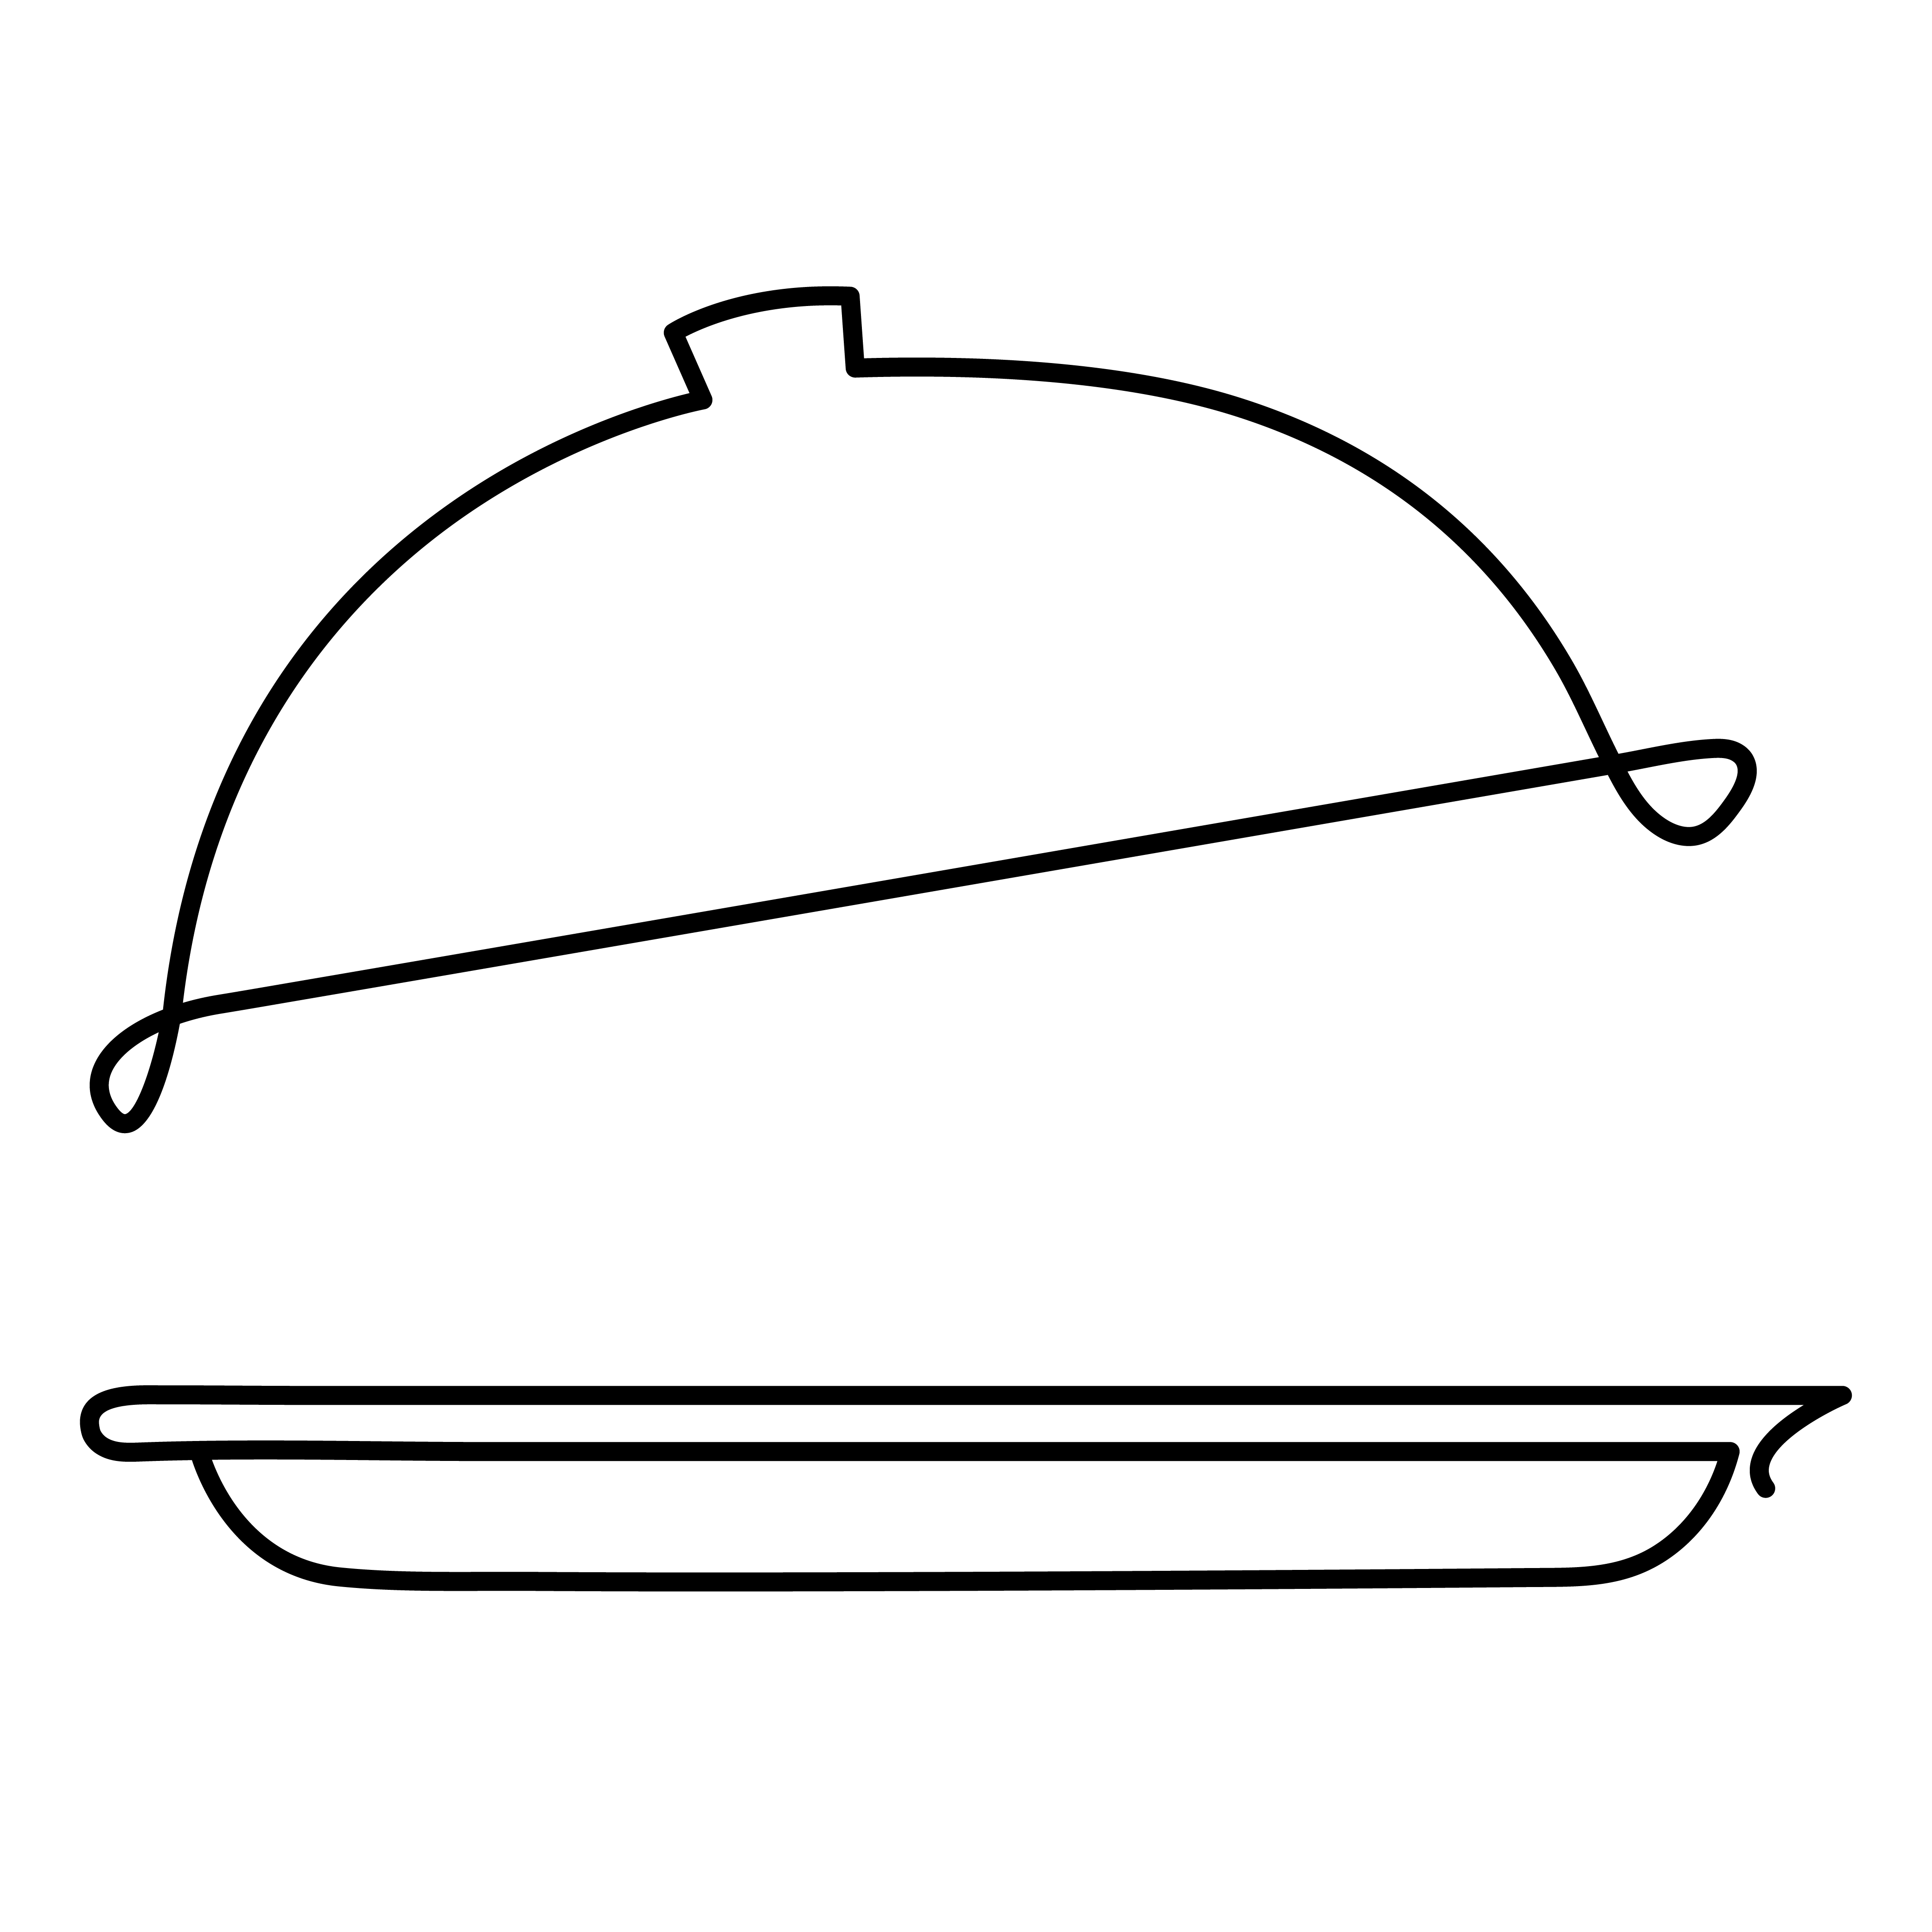 Simpmenu